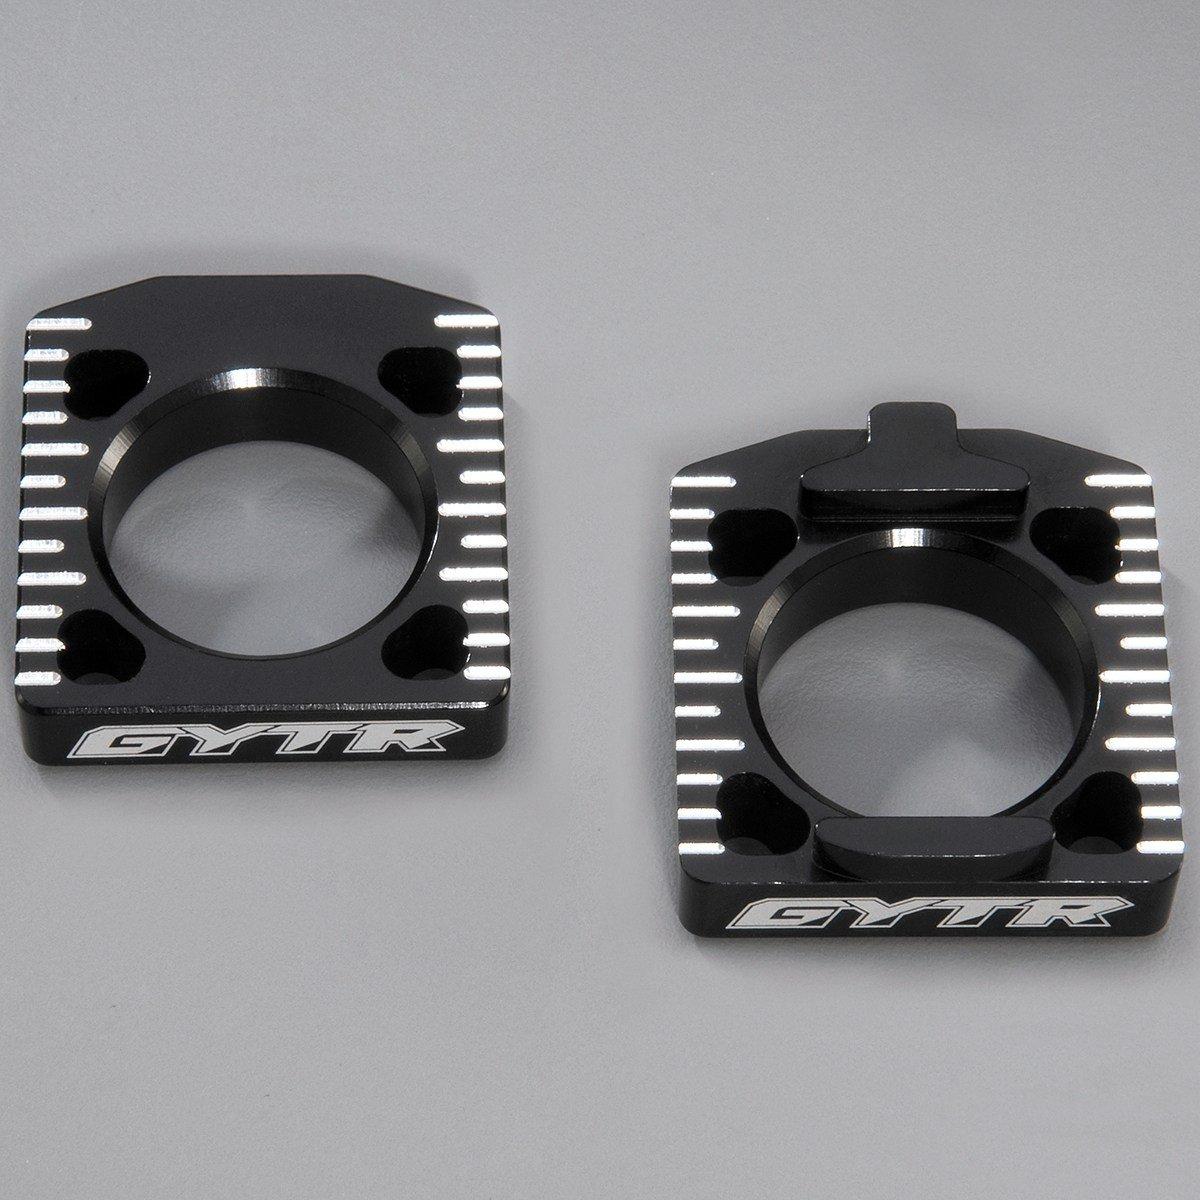 YAMAHA GYTR BILLET OFFSET AXLE BLACK BLOCKS YZ450F '10-'18-YZ250F '11-'18 33DF53M0T000